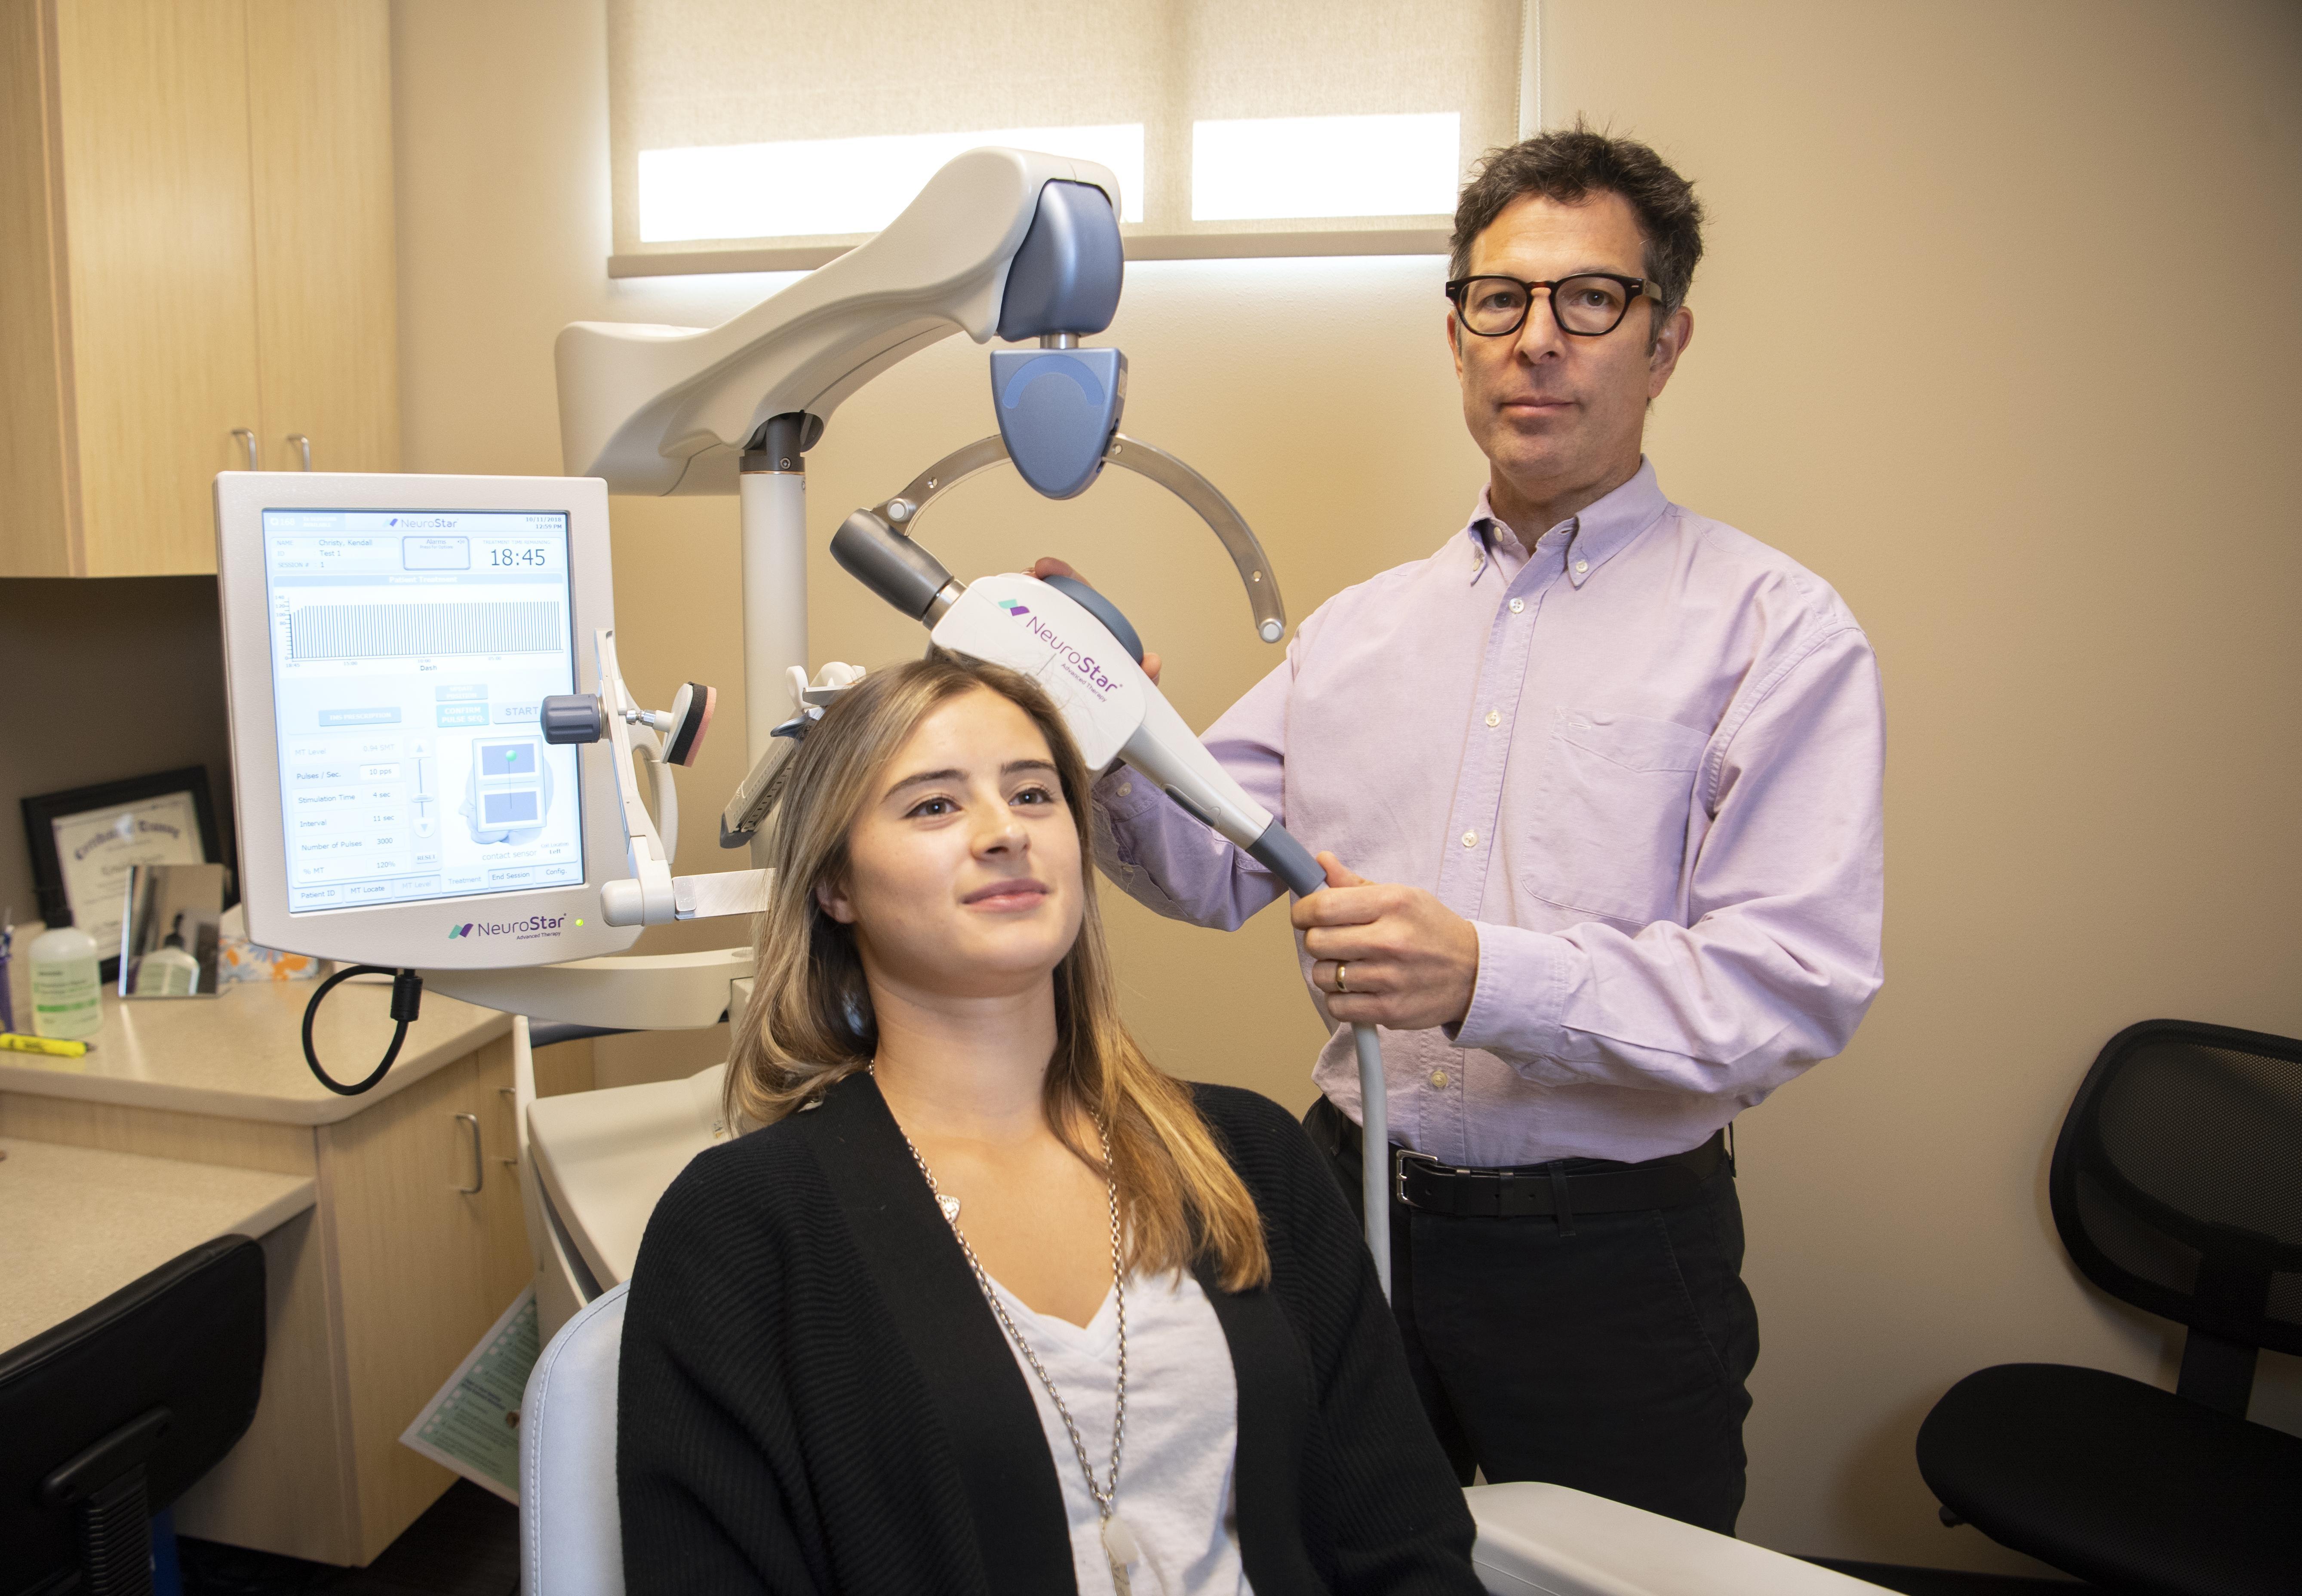 Subtle stimulation: Spokane neurologist offering transcranial